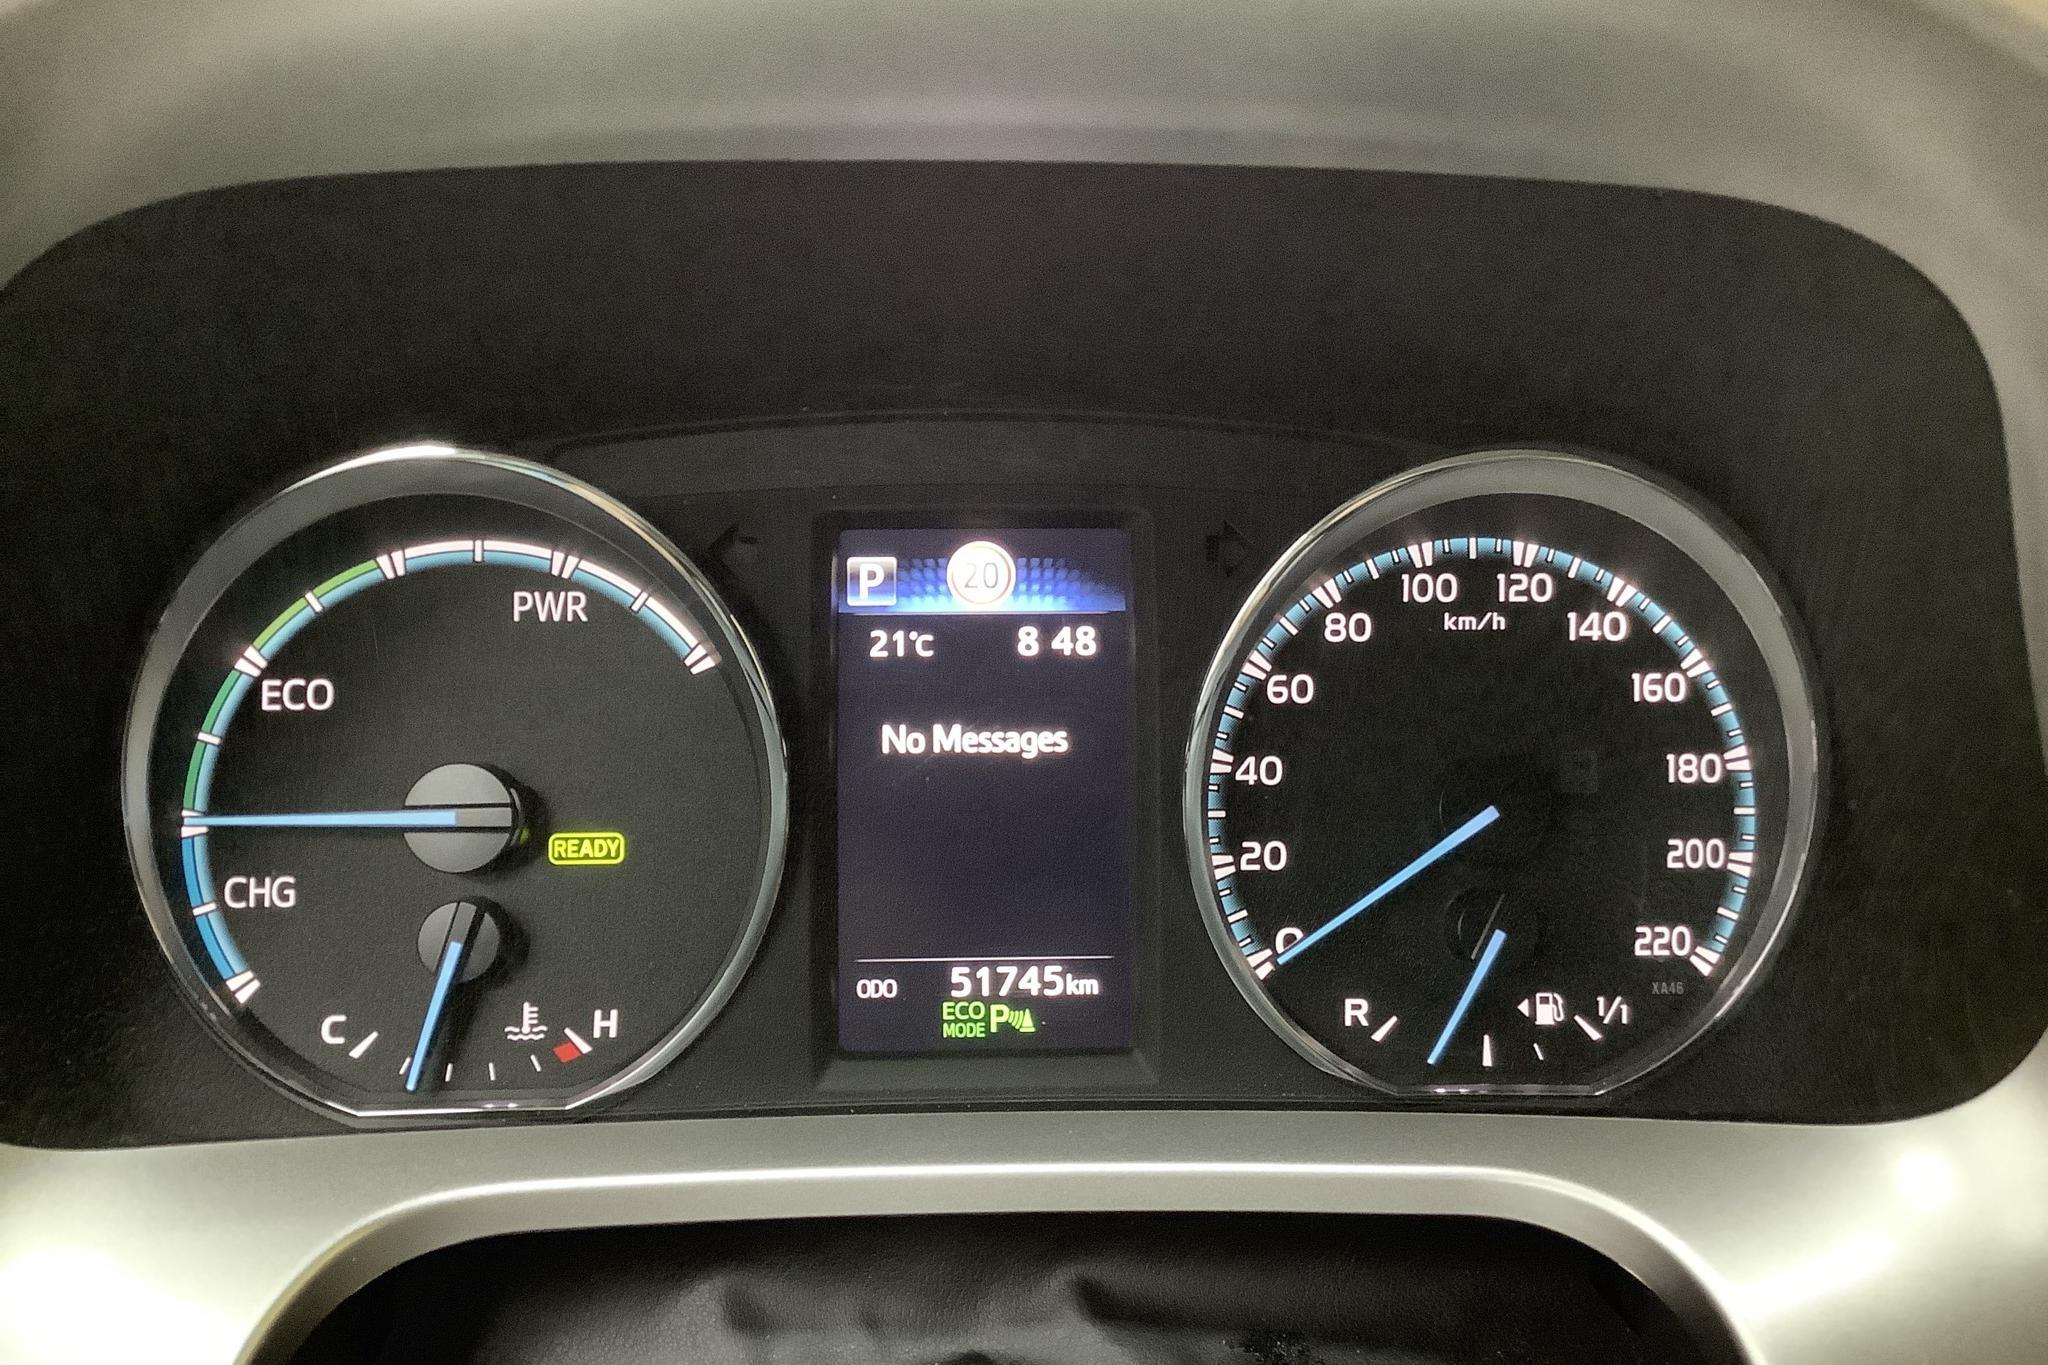 Toyota RAV4 2.5 HSD AWD (197hk) - 51 750 km - Automatic - white - 2018